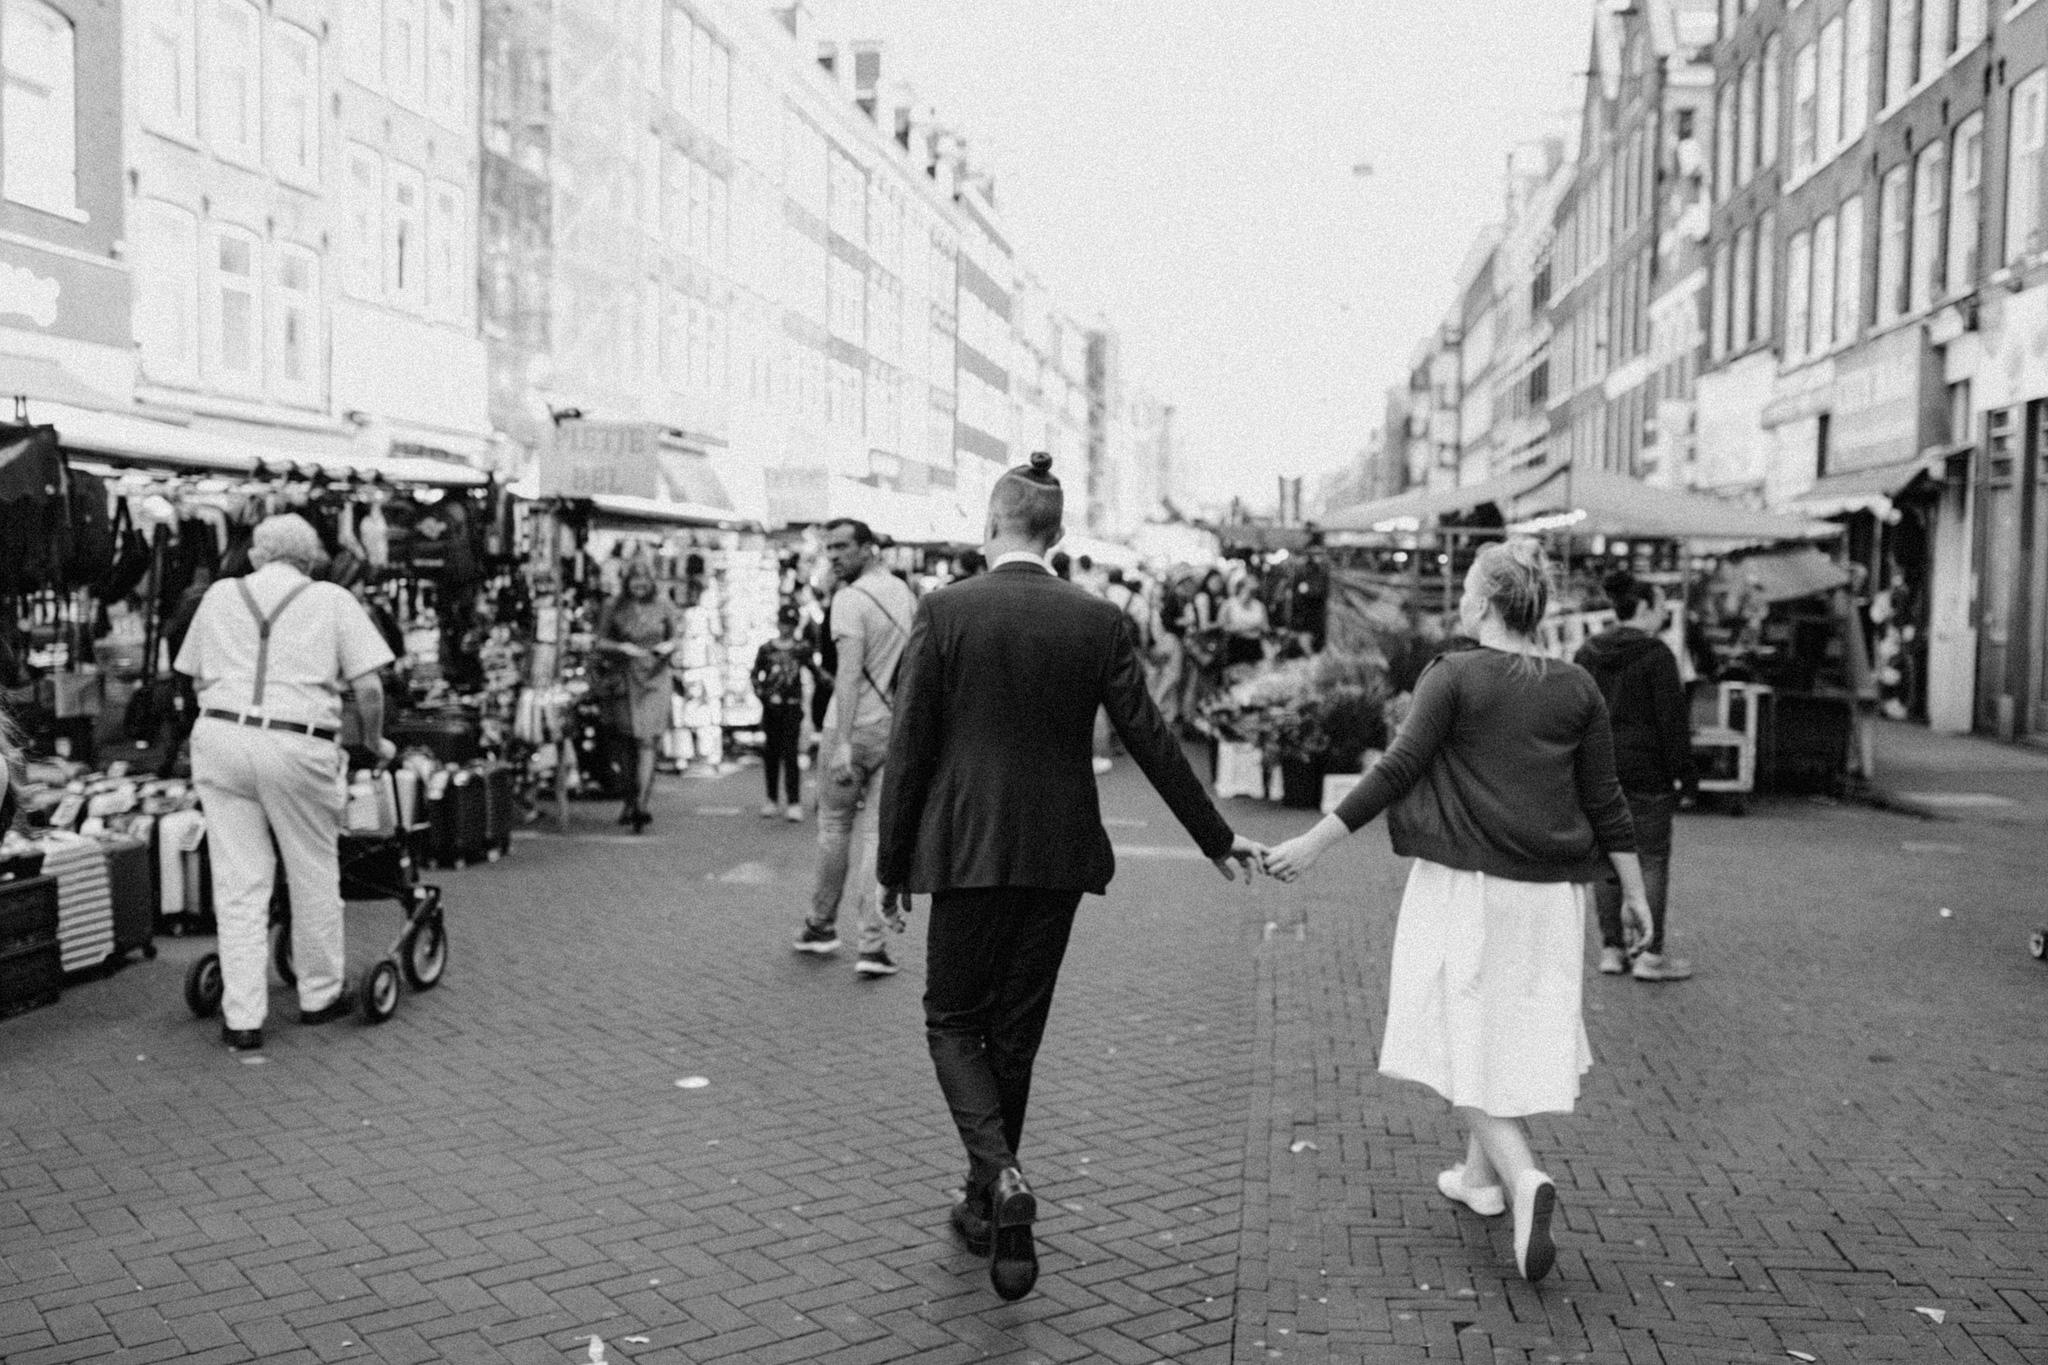 Elopement couple walking hand in hand at Albert Cuyp market Amsterdam